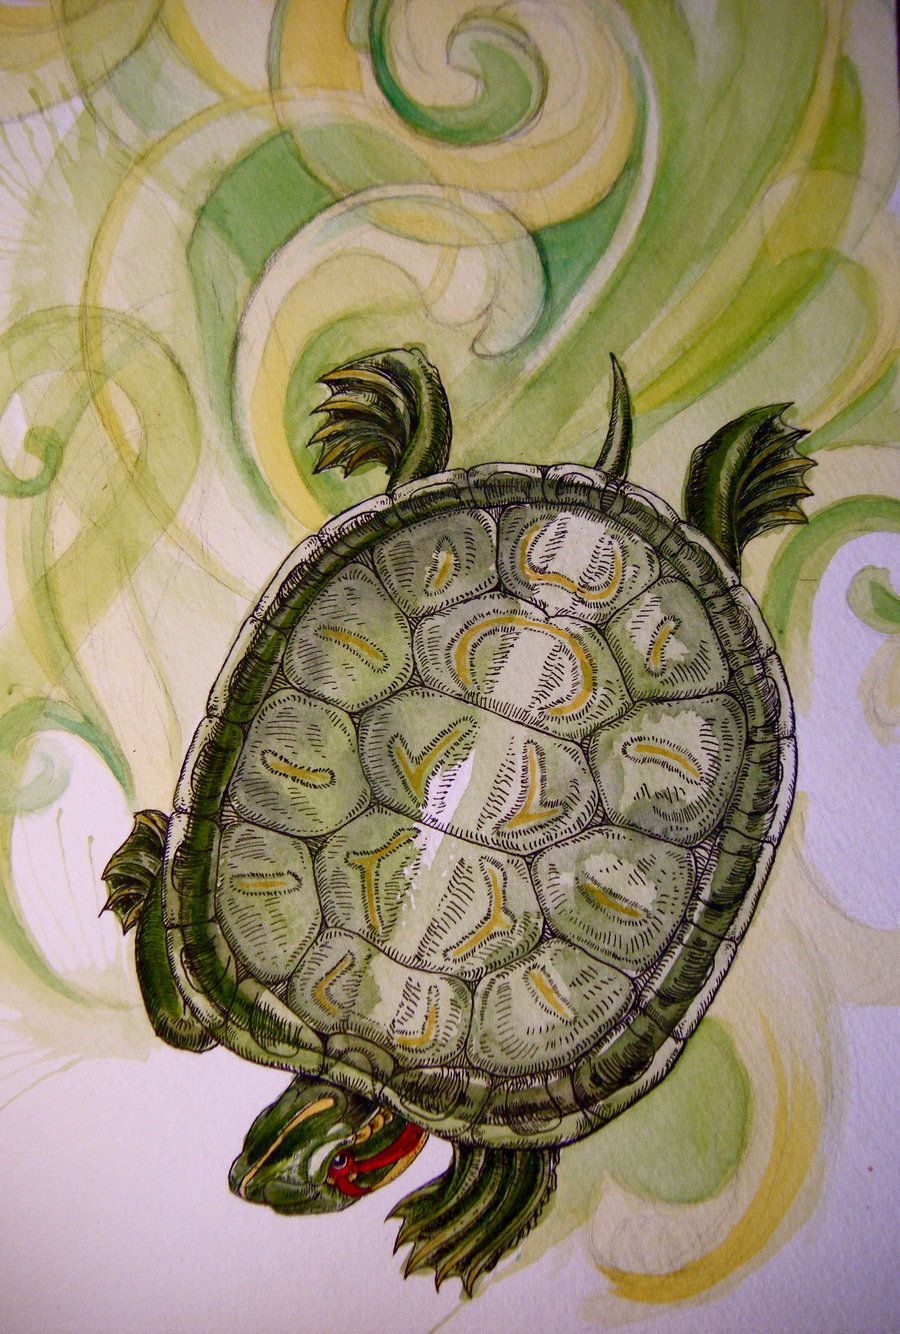 READ EARED SLIDER TURTLE ILLUSTRATION PAINTING PET REPTILE ART REAL CANVAS PRINT